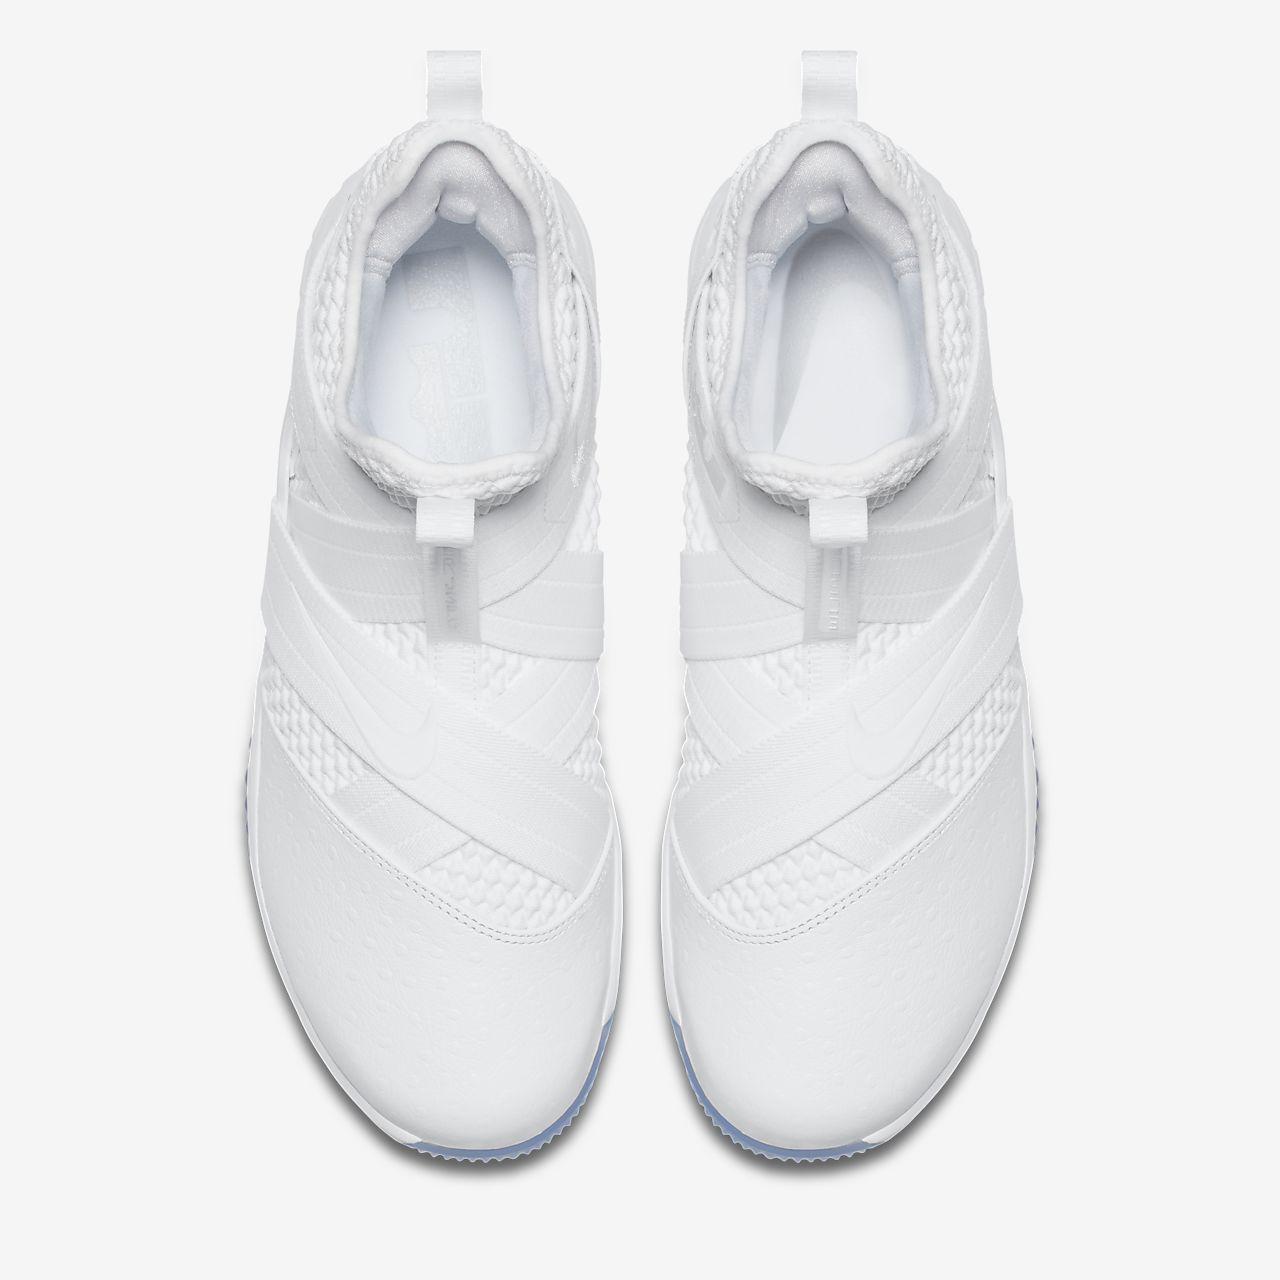 2c6b93e2a024 LeBron Soldier 12 SFG Basketball Shoe. Nike.com NZ